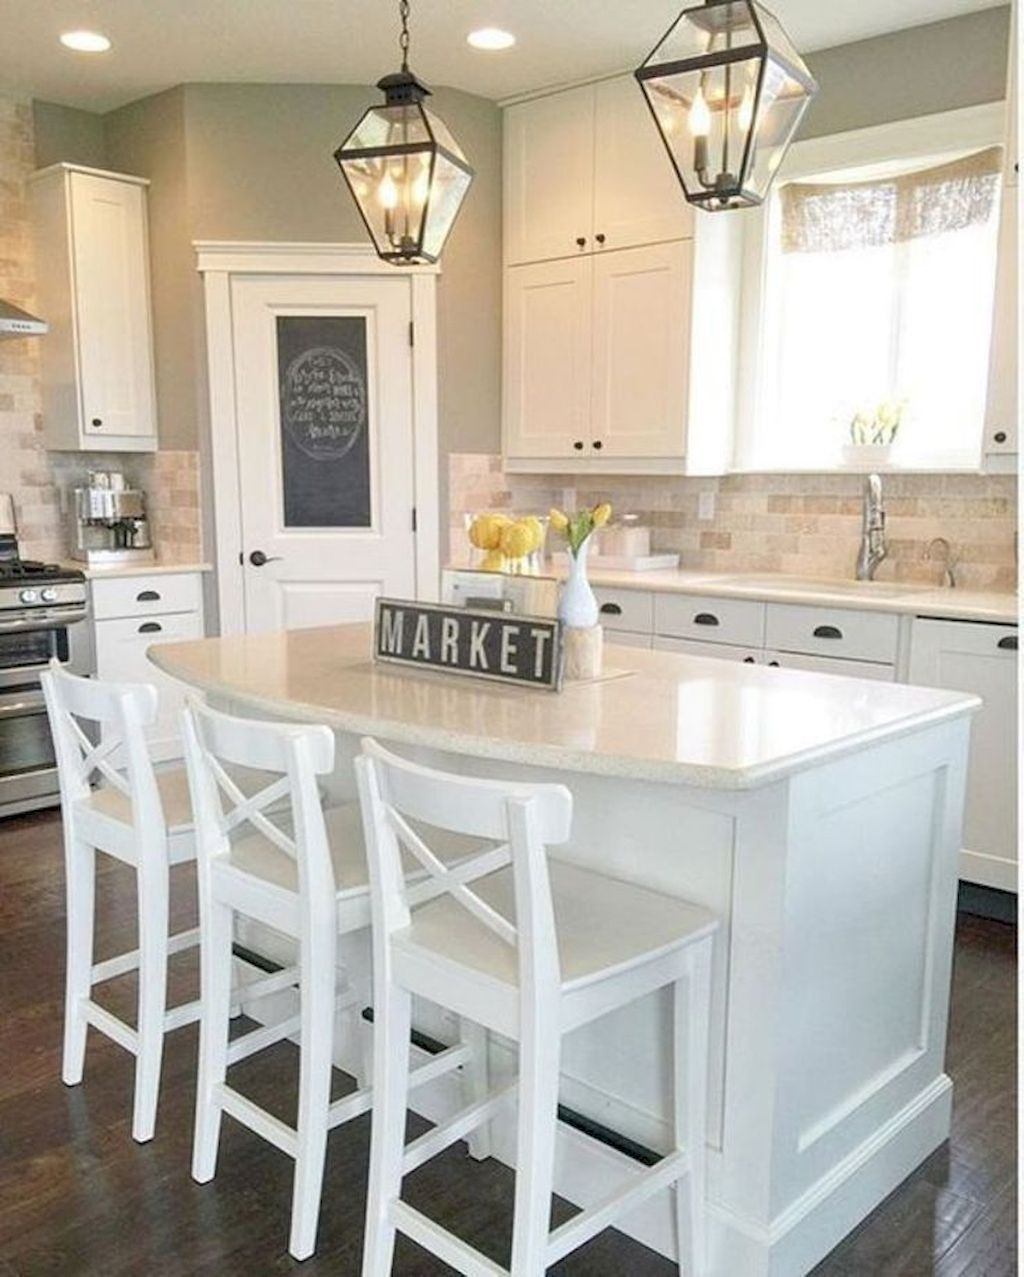 80+ Awesome Rustic Farmhouse Kitchen Cabinets Decor Ideas